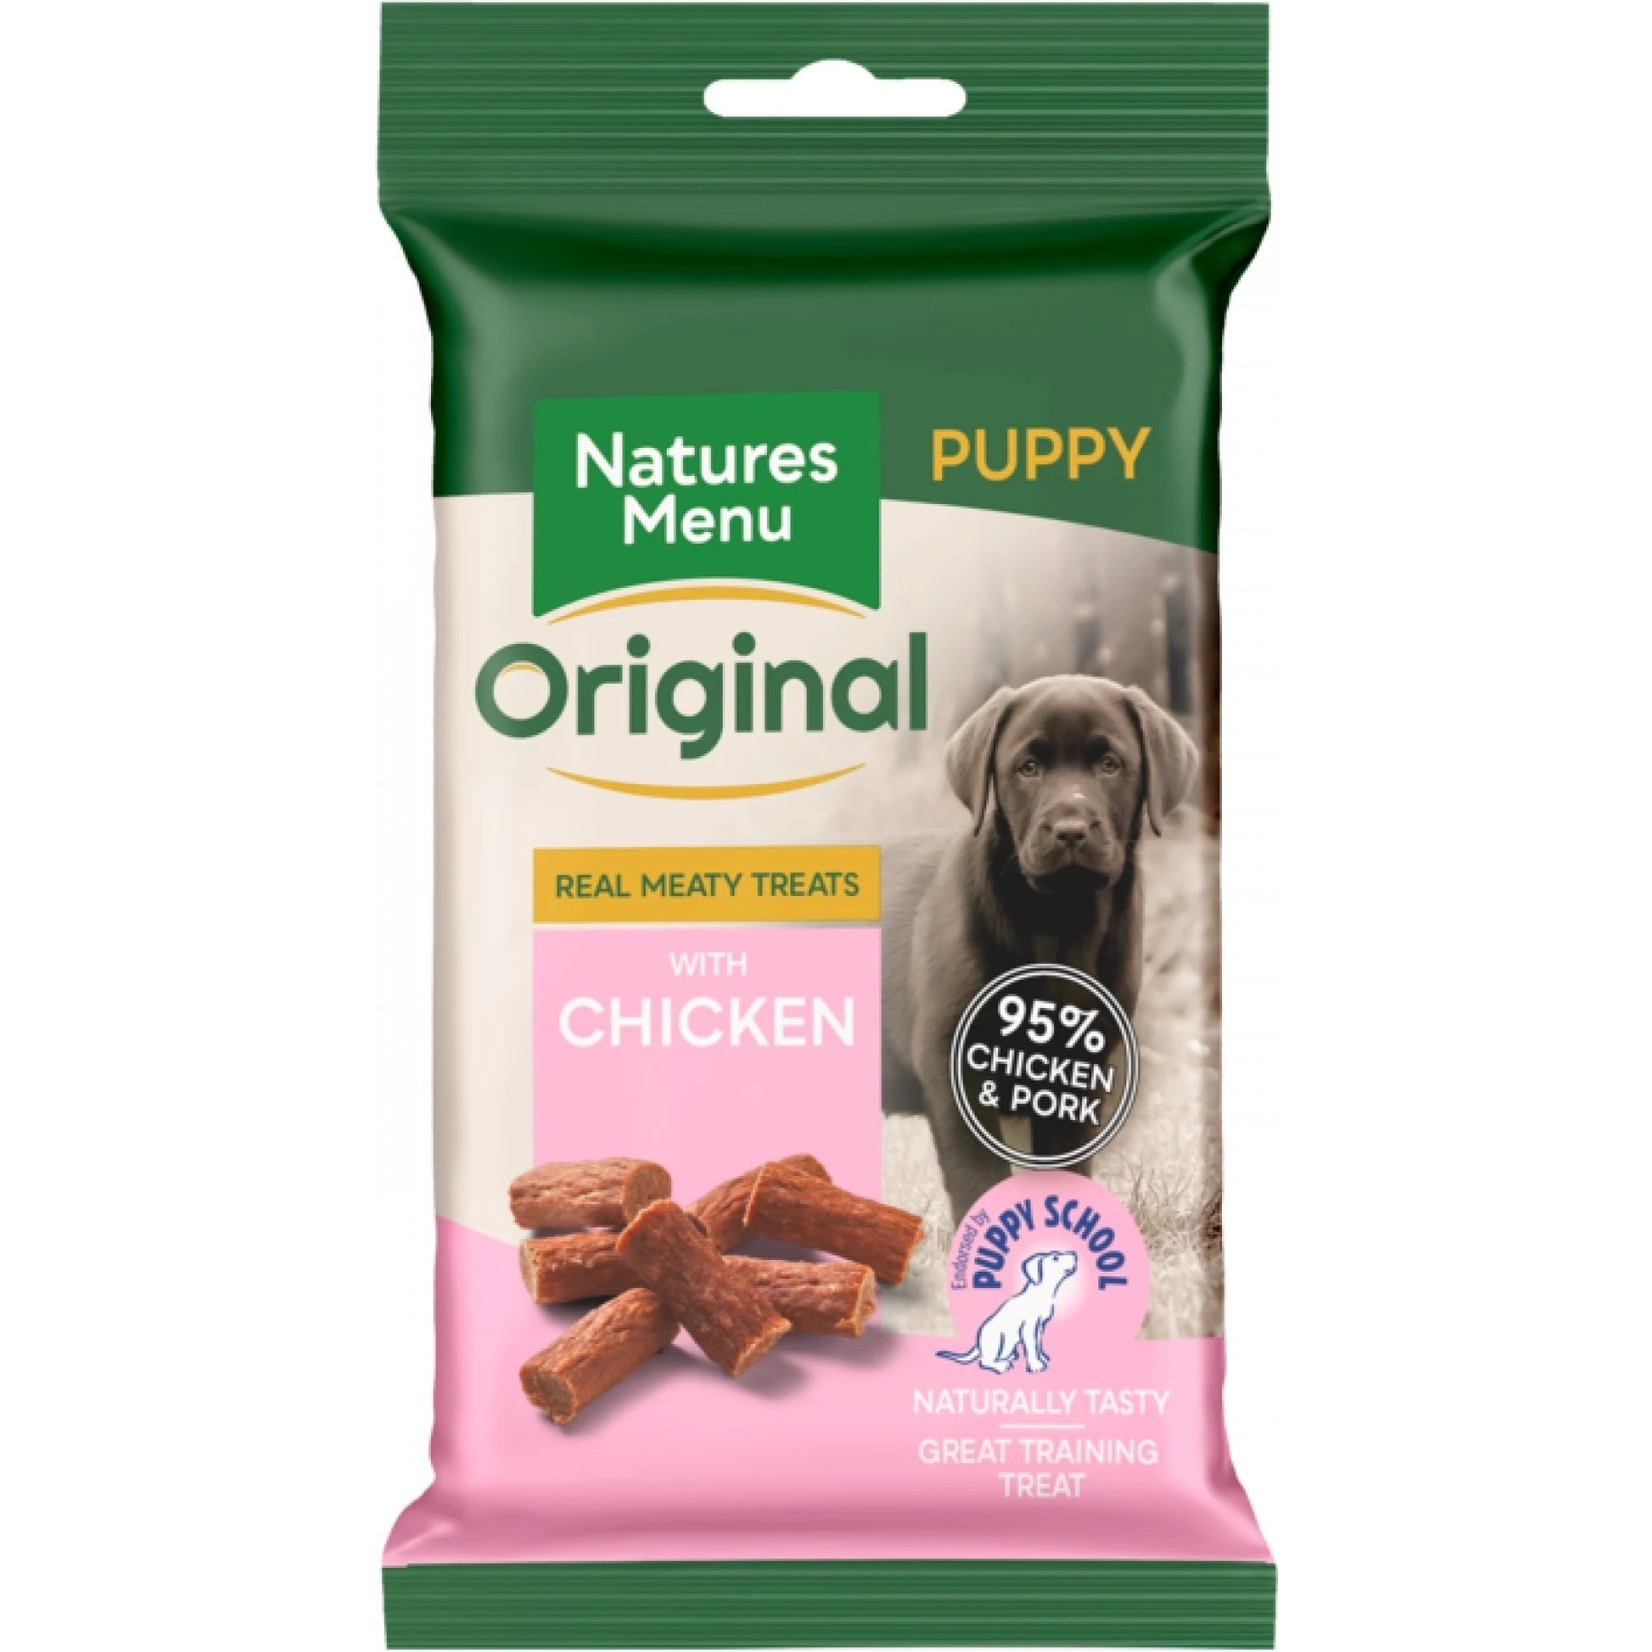 natures menu Real Meaty Grain Free Chicken Puppy Treats, 60g